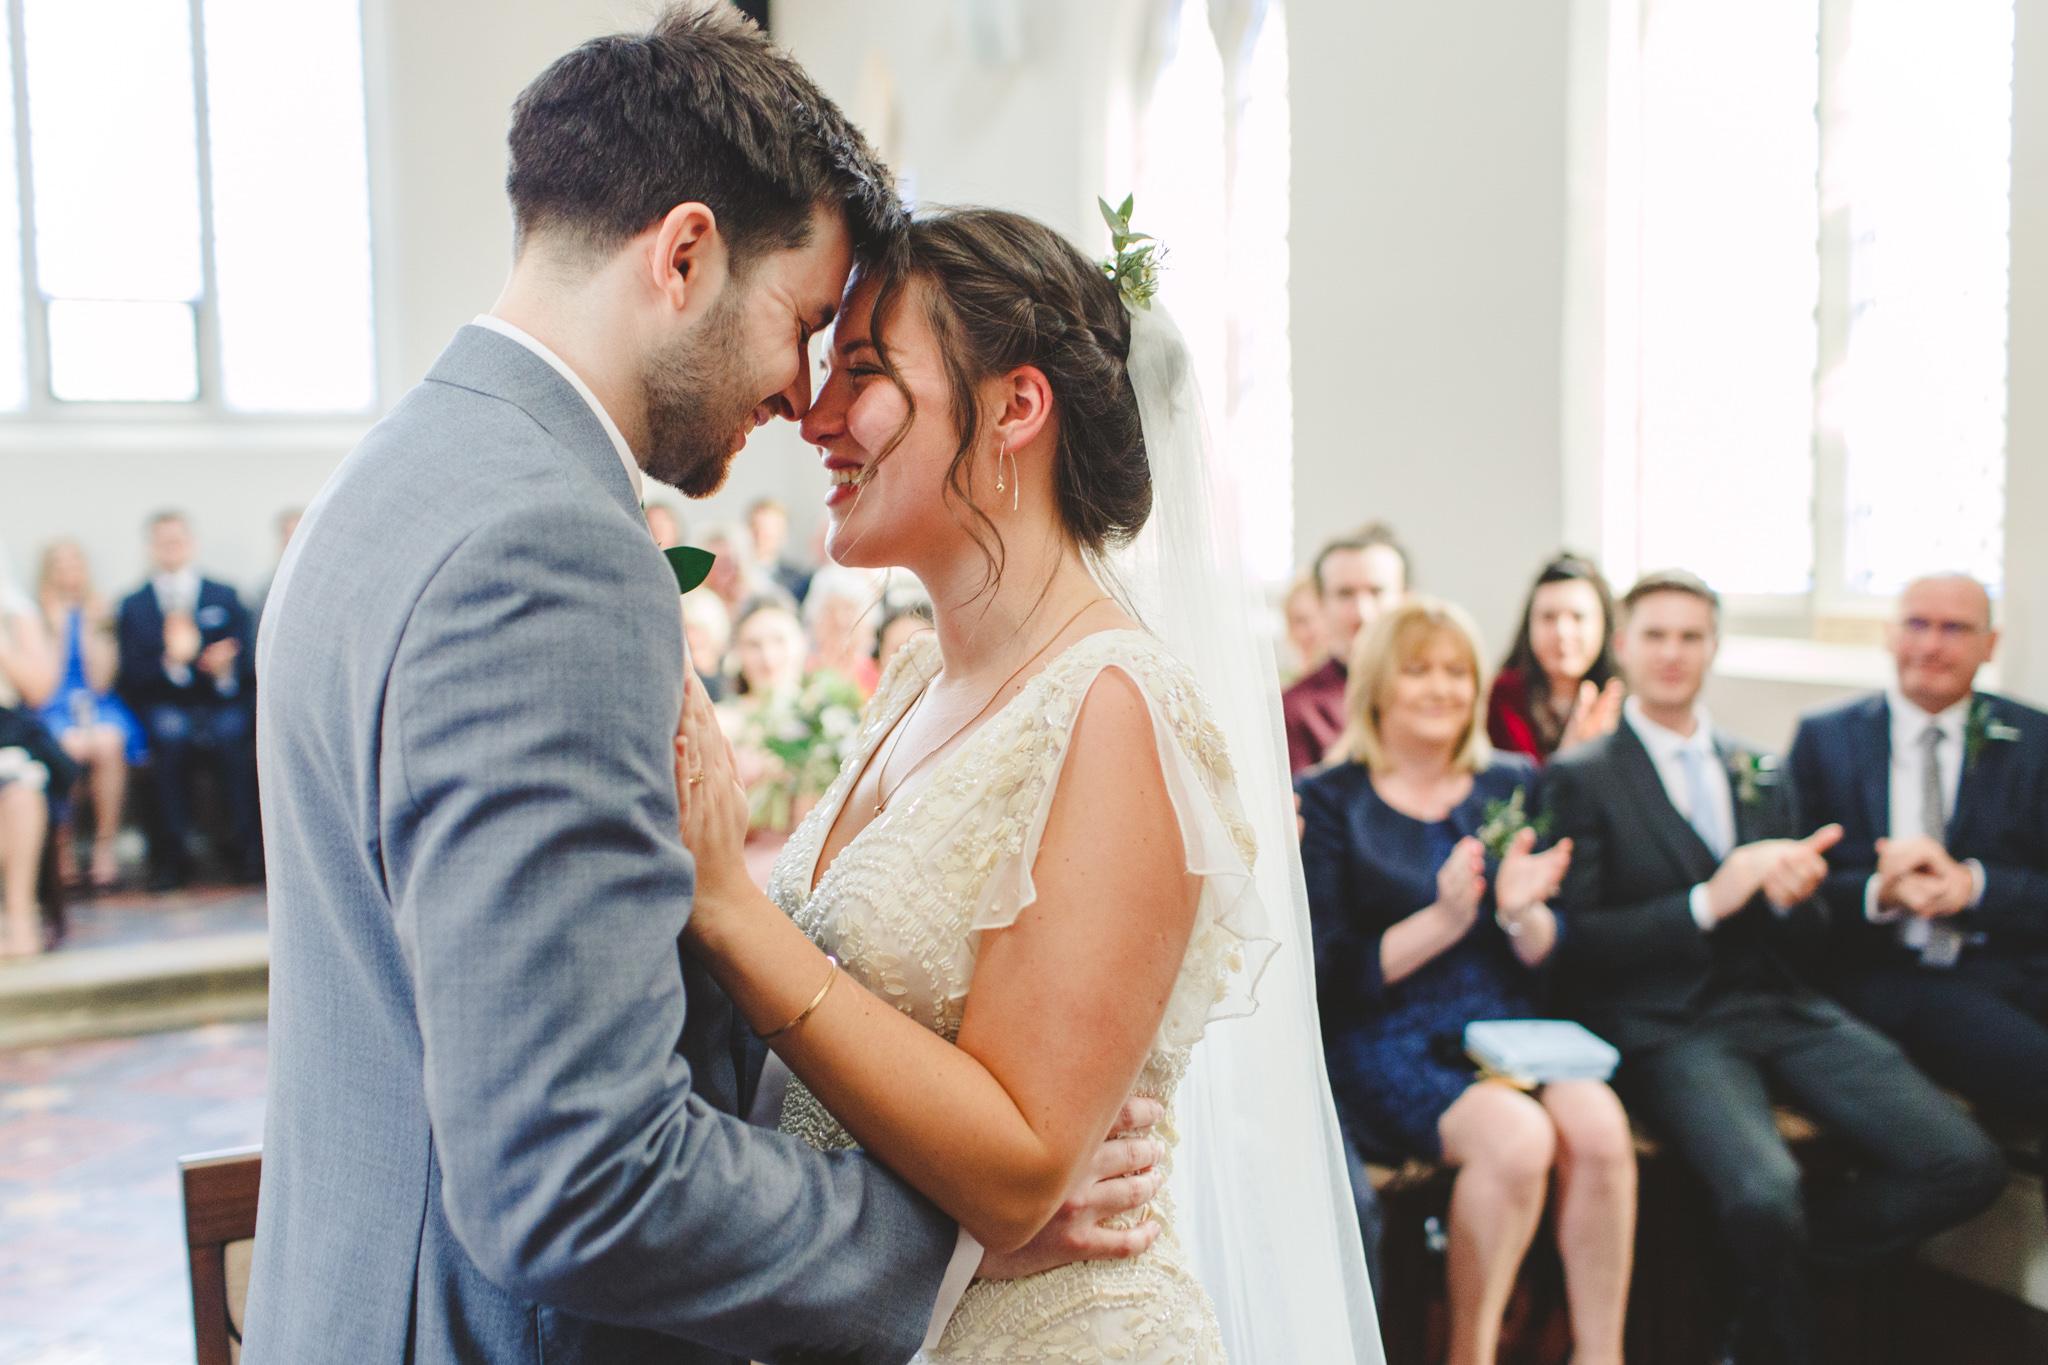 derbyshire-wedding-photographer-march-april-8.jpg